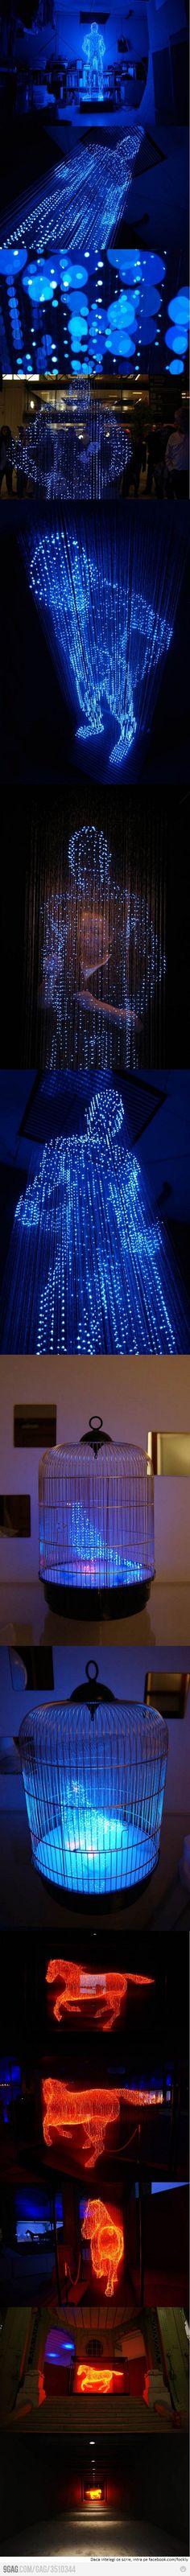 Incredible light statues by Makoto Tojiki